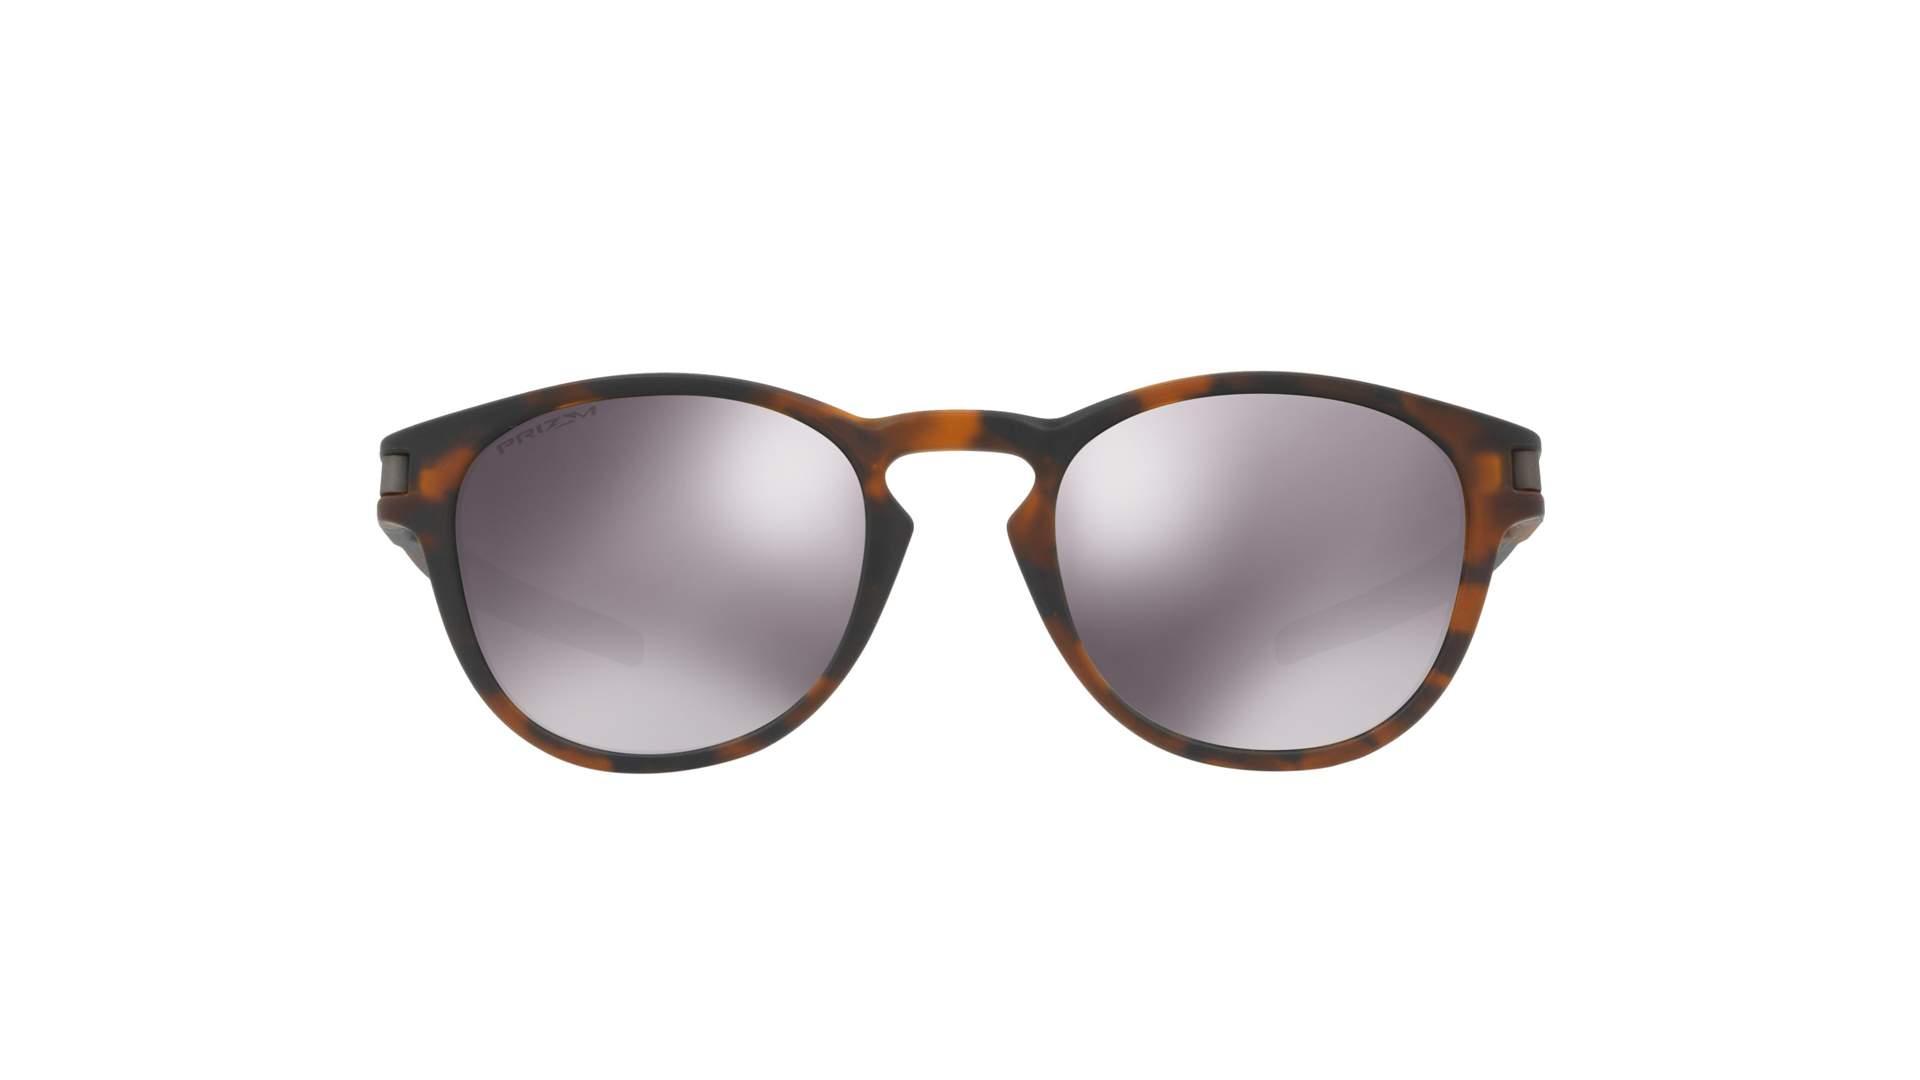 55a20603e3c69 Sunglasses Oakley Latch Tortoise Matte Prizm OO9265 22 53-21 Medium Mirror